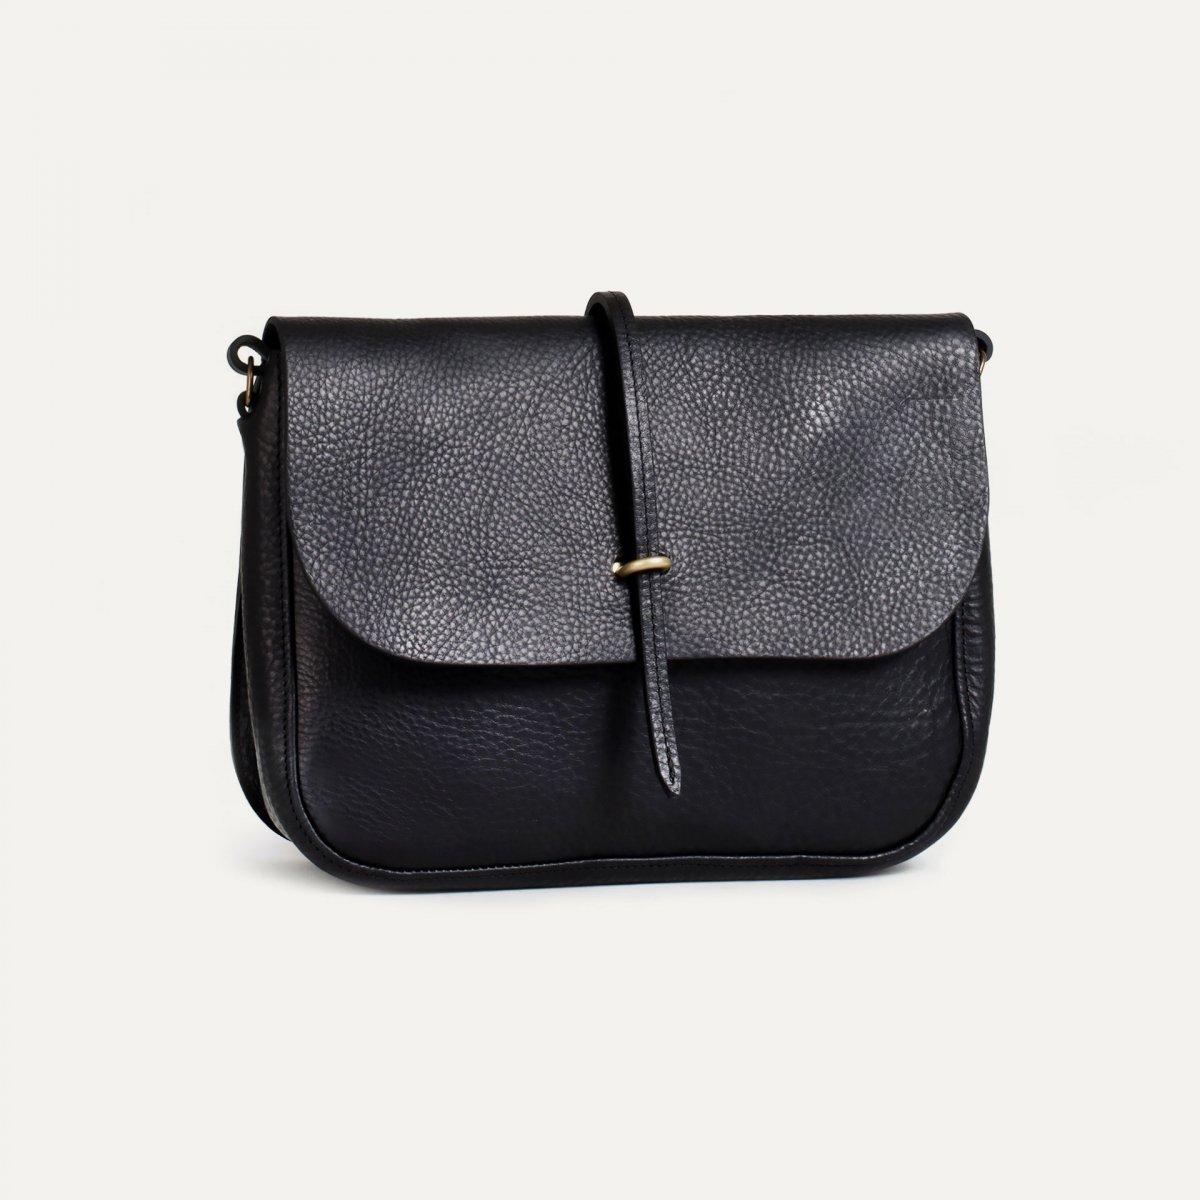 Pastel handbag - Black (image n°2)